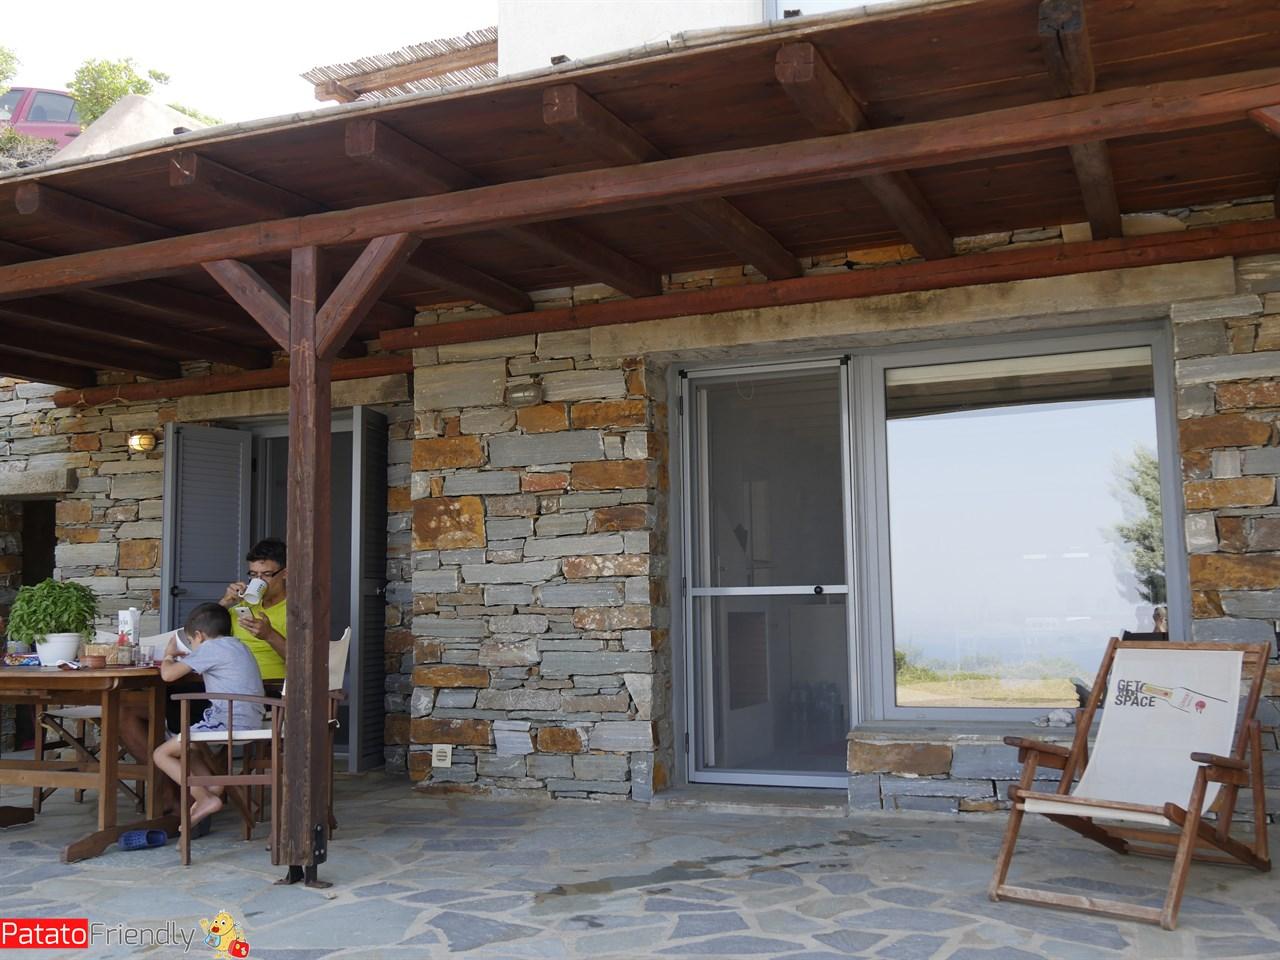 [cml_media_alt id='12303']affittare una casa a Kea[/cml_media_alt]